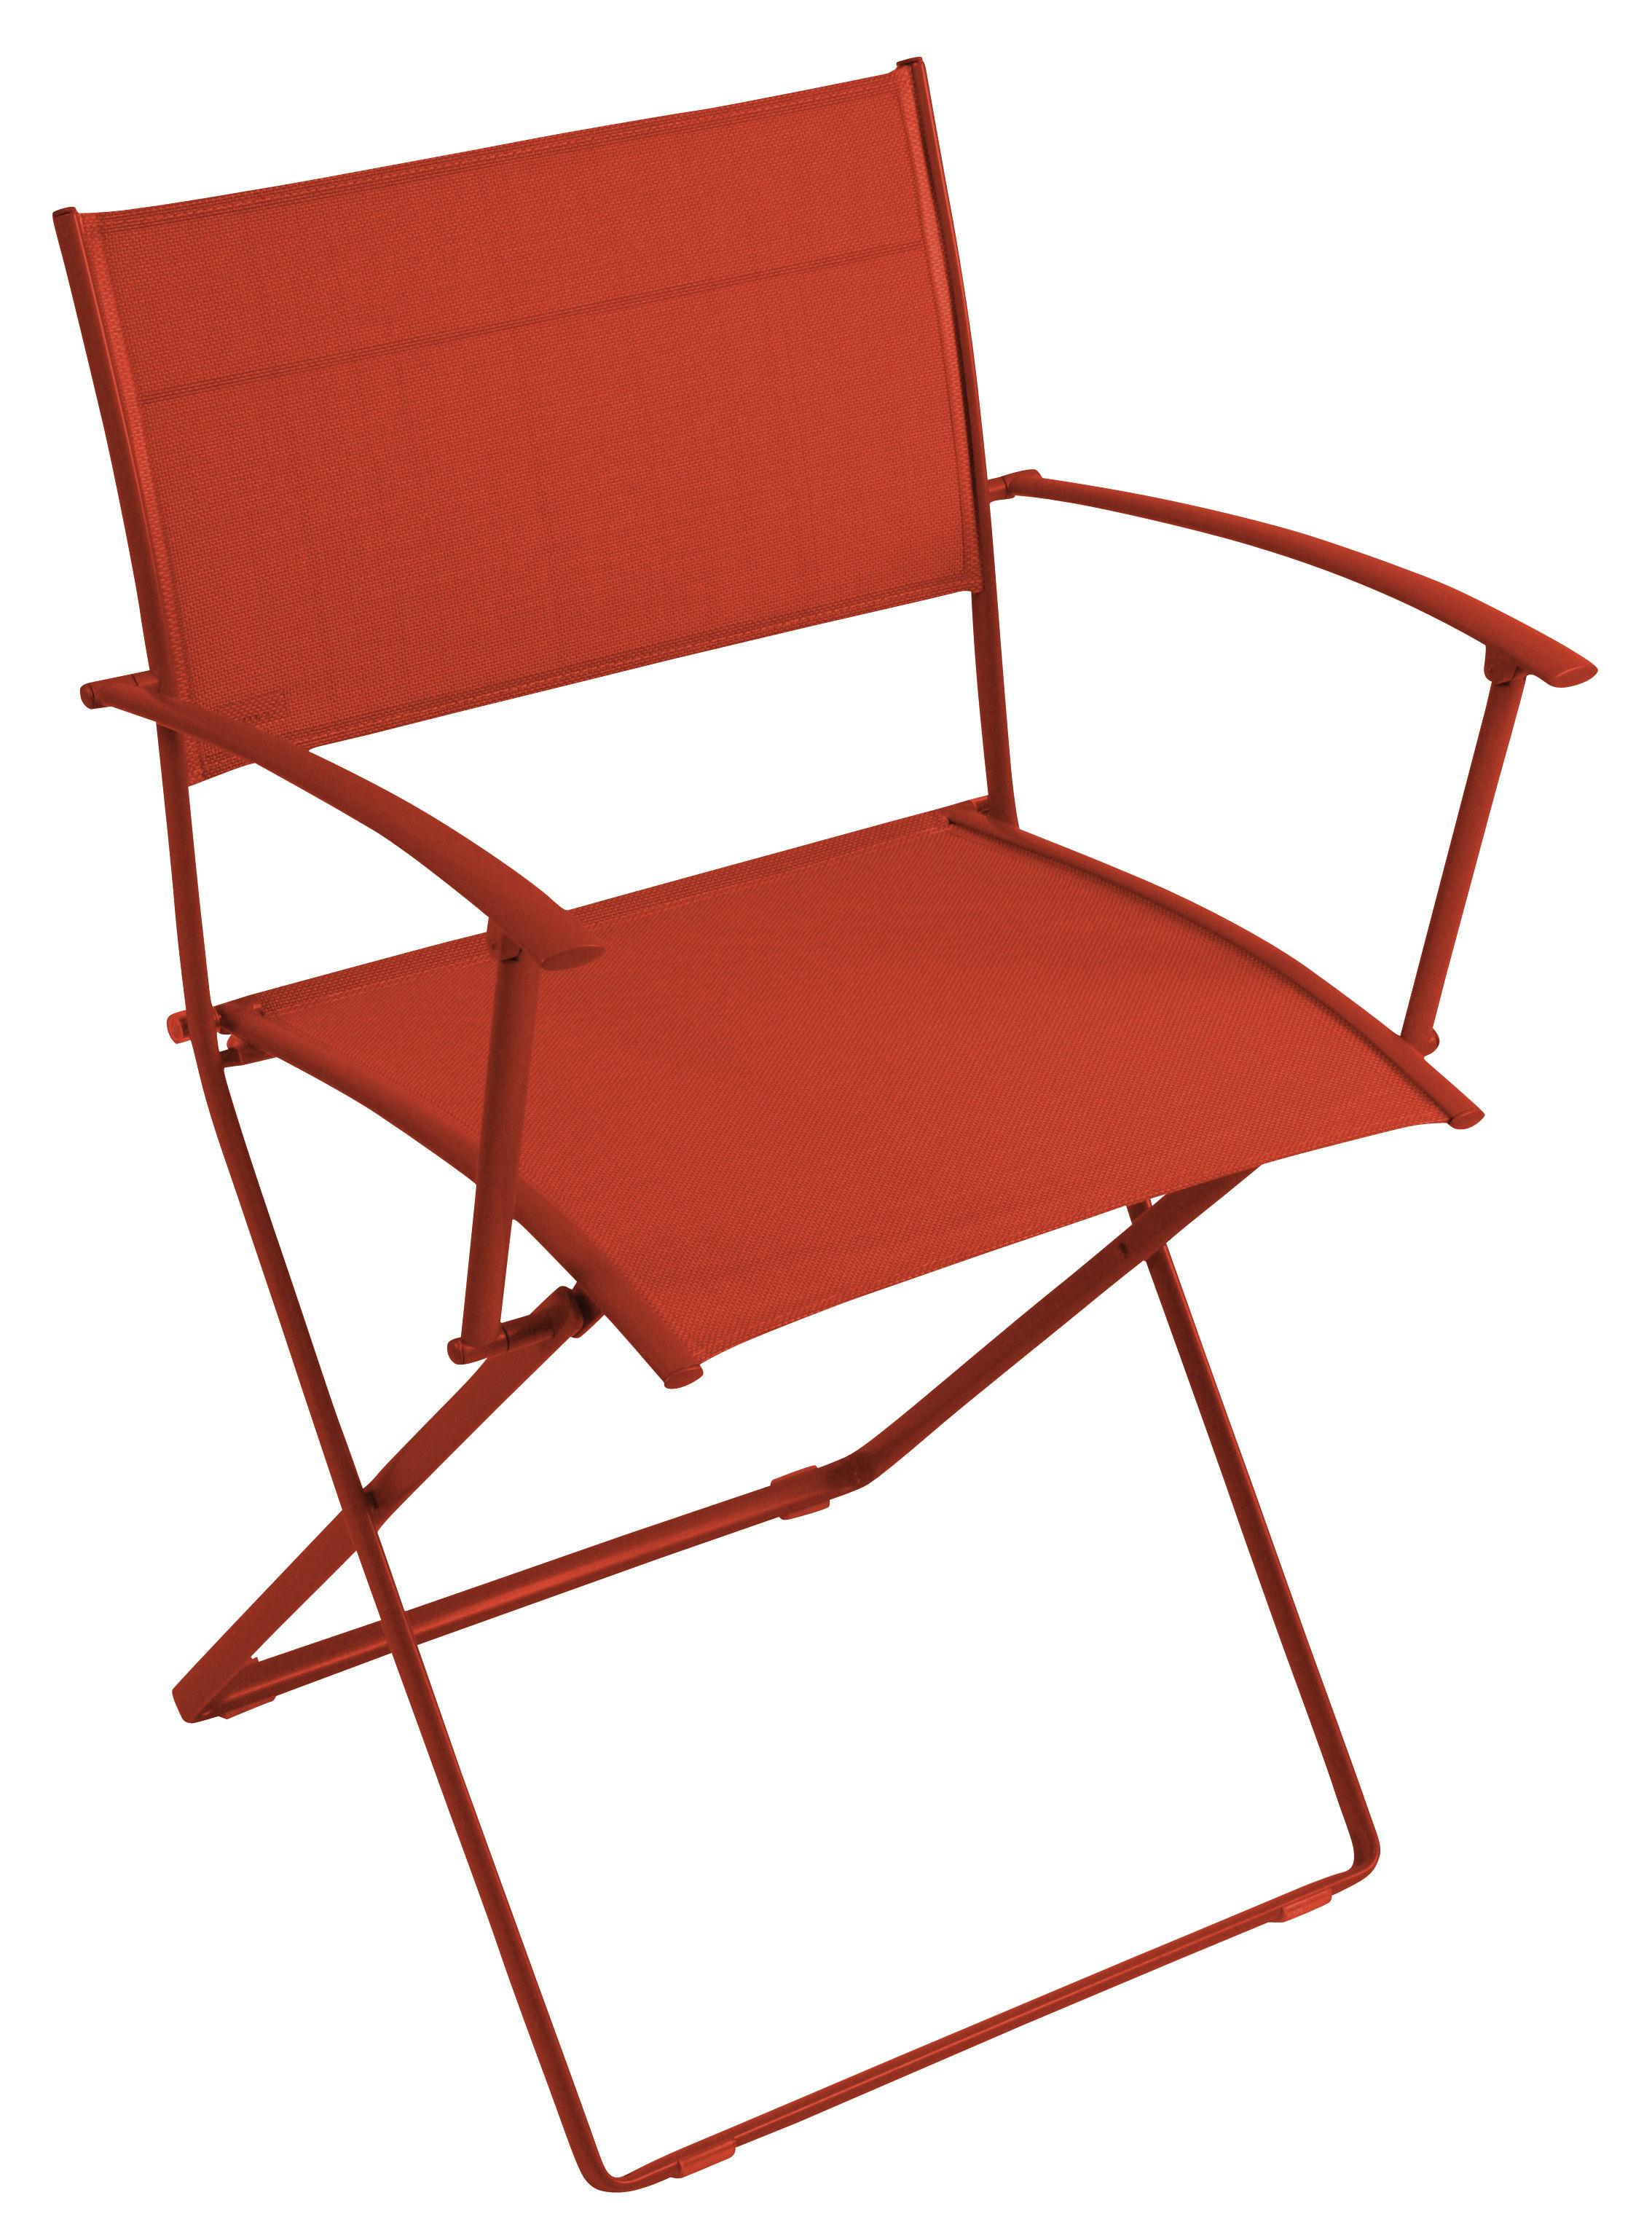 fauteuil pliant plein air toile paprika chin fermob. Black Bedroom Furniture Sets. Home Design Ideas